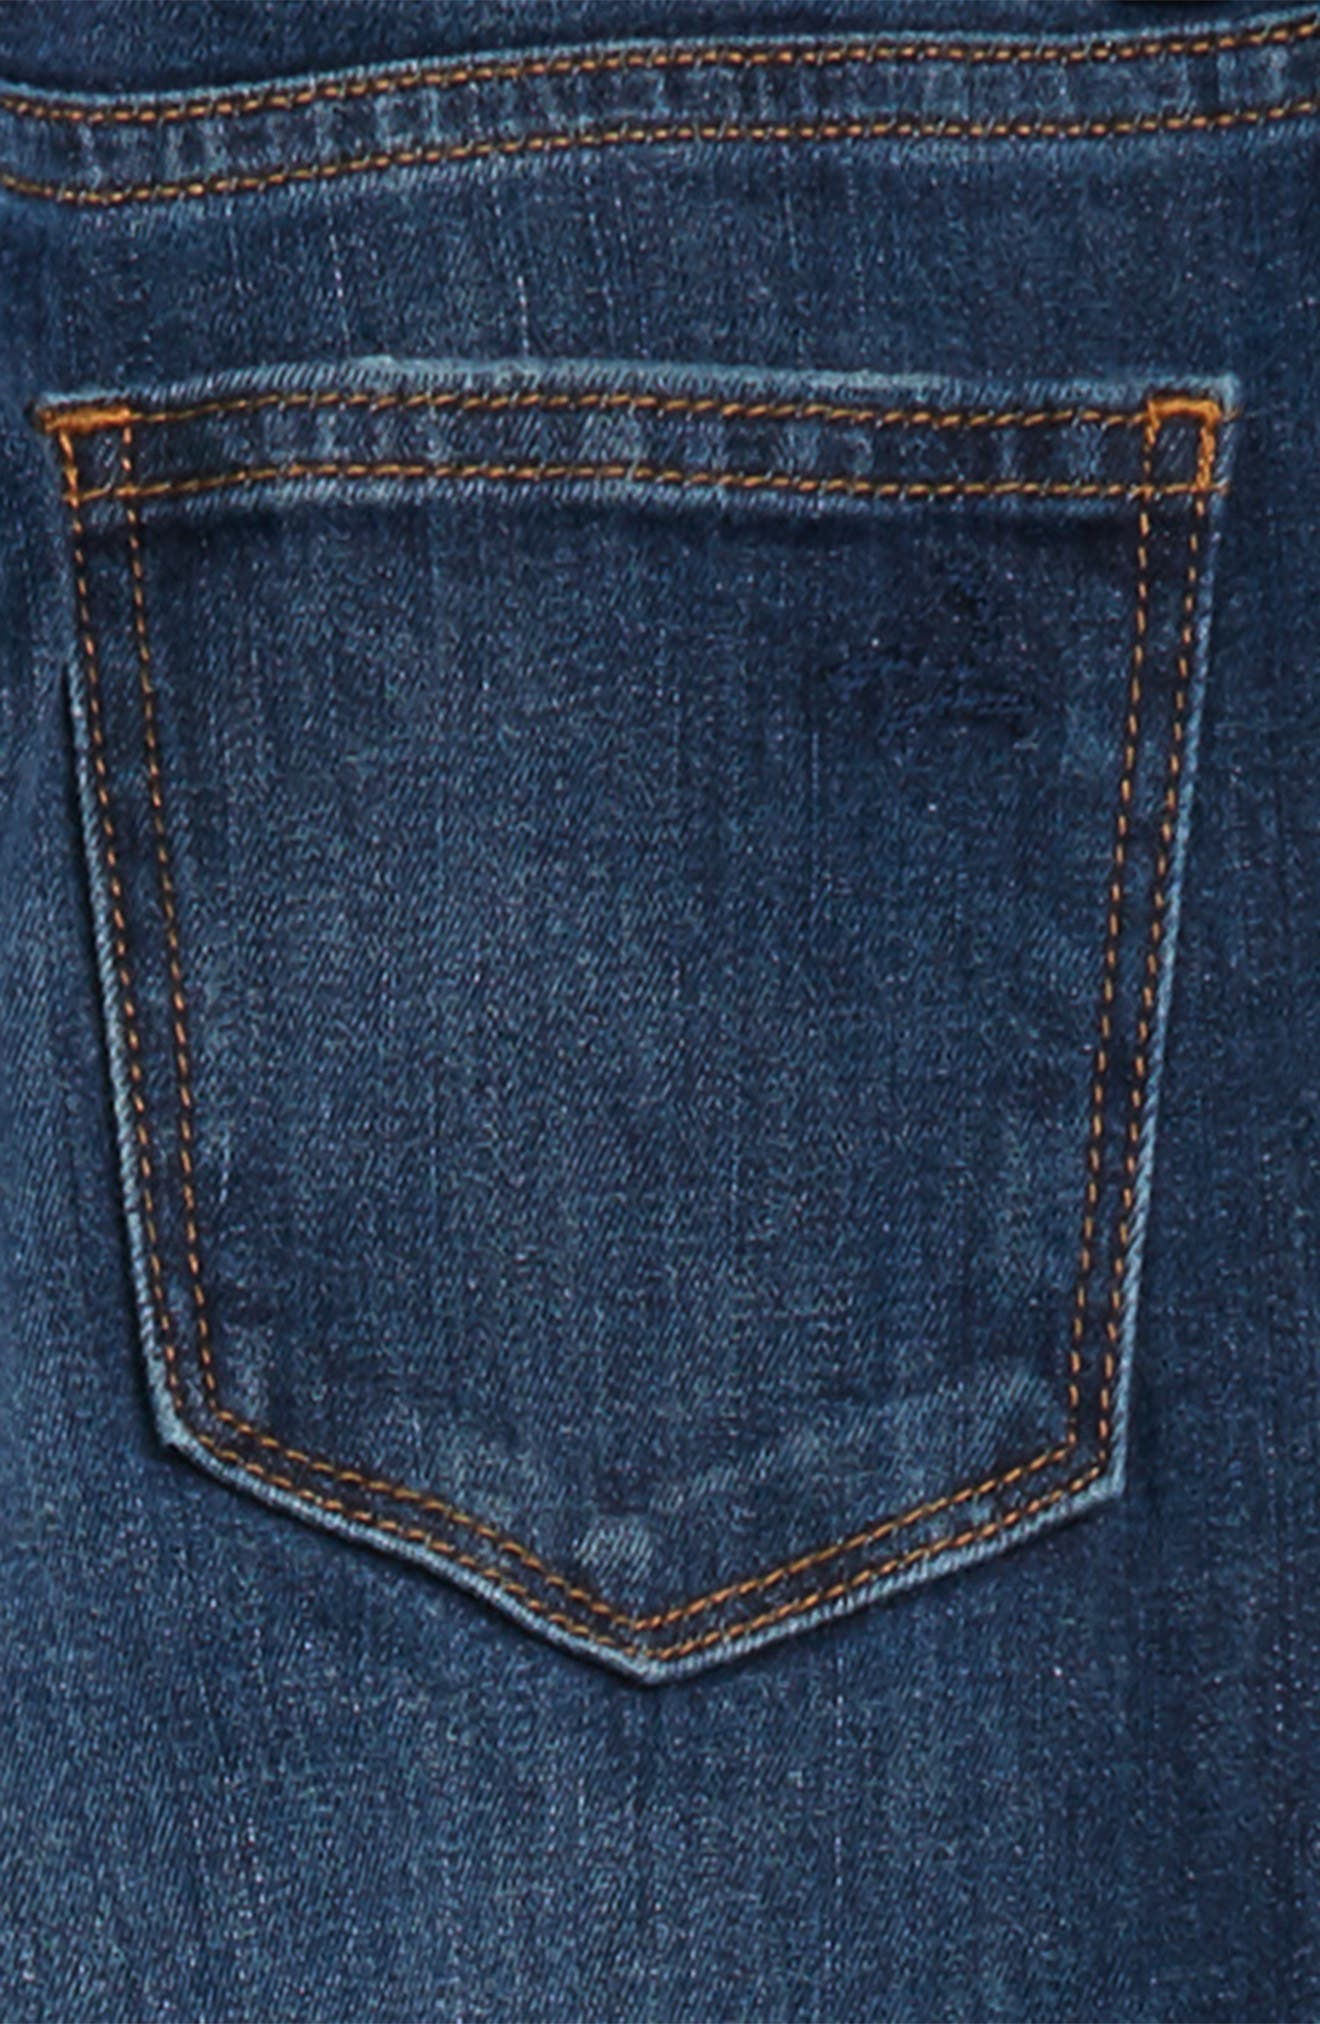 Hawke Skinny Jeans,                             Alternate thumbnail 3, color,                             425